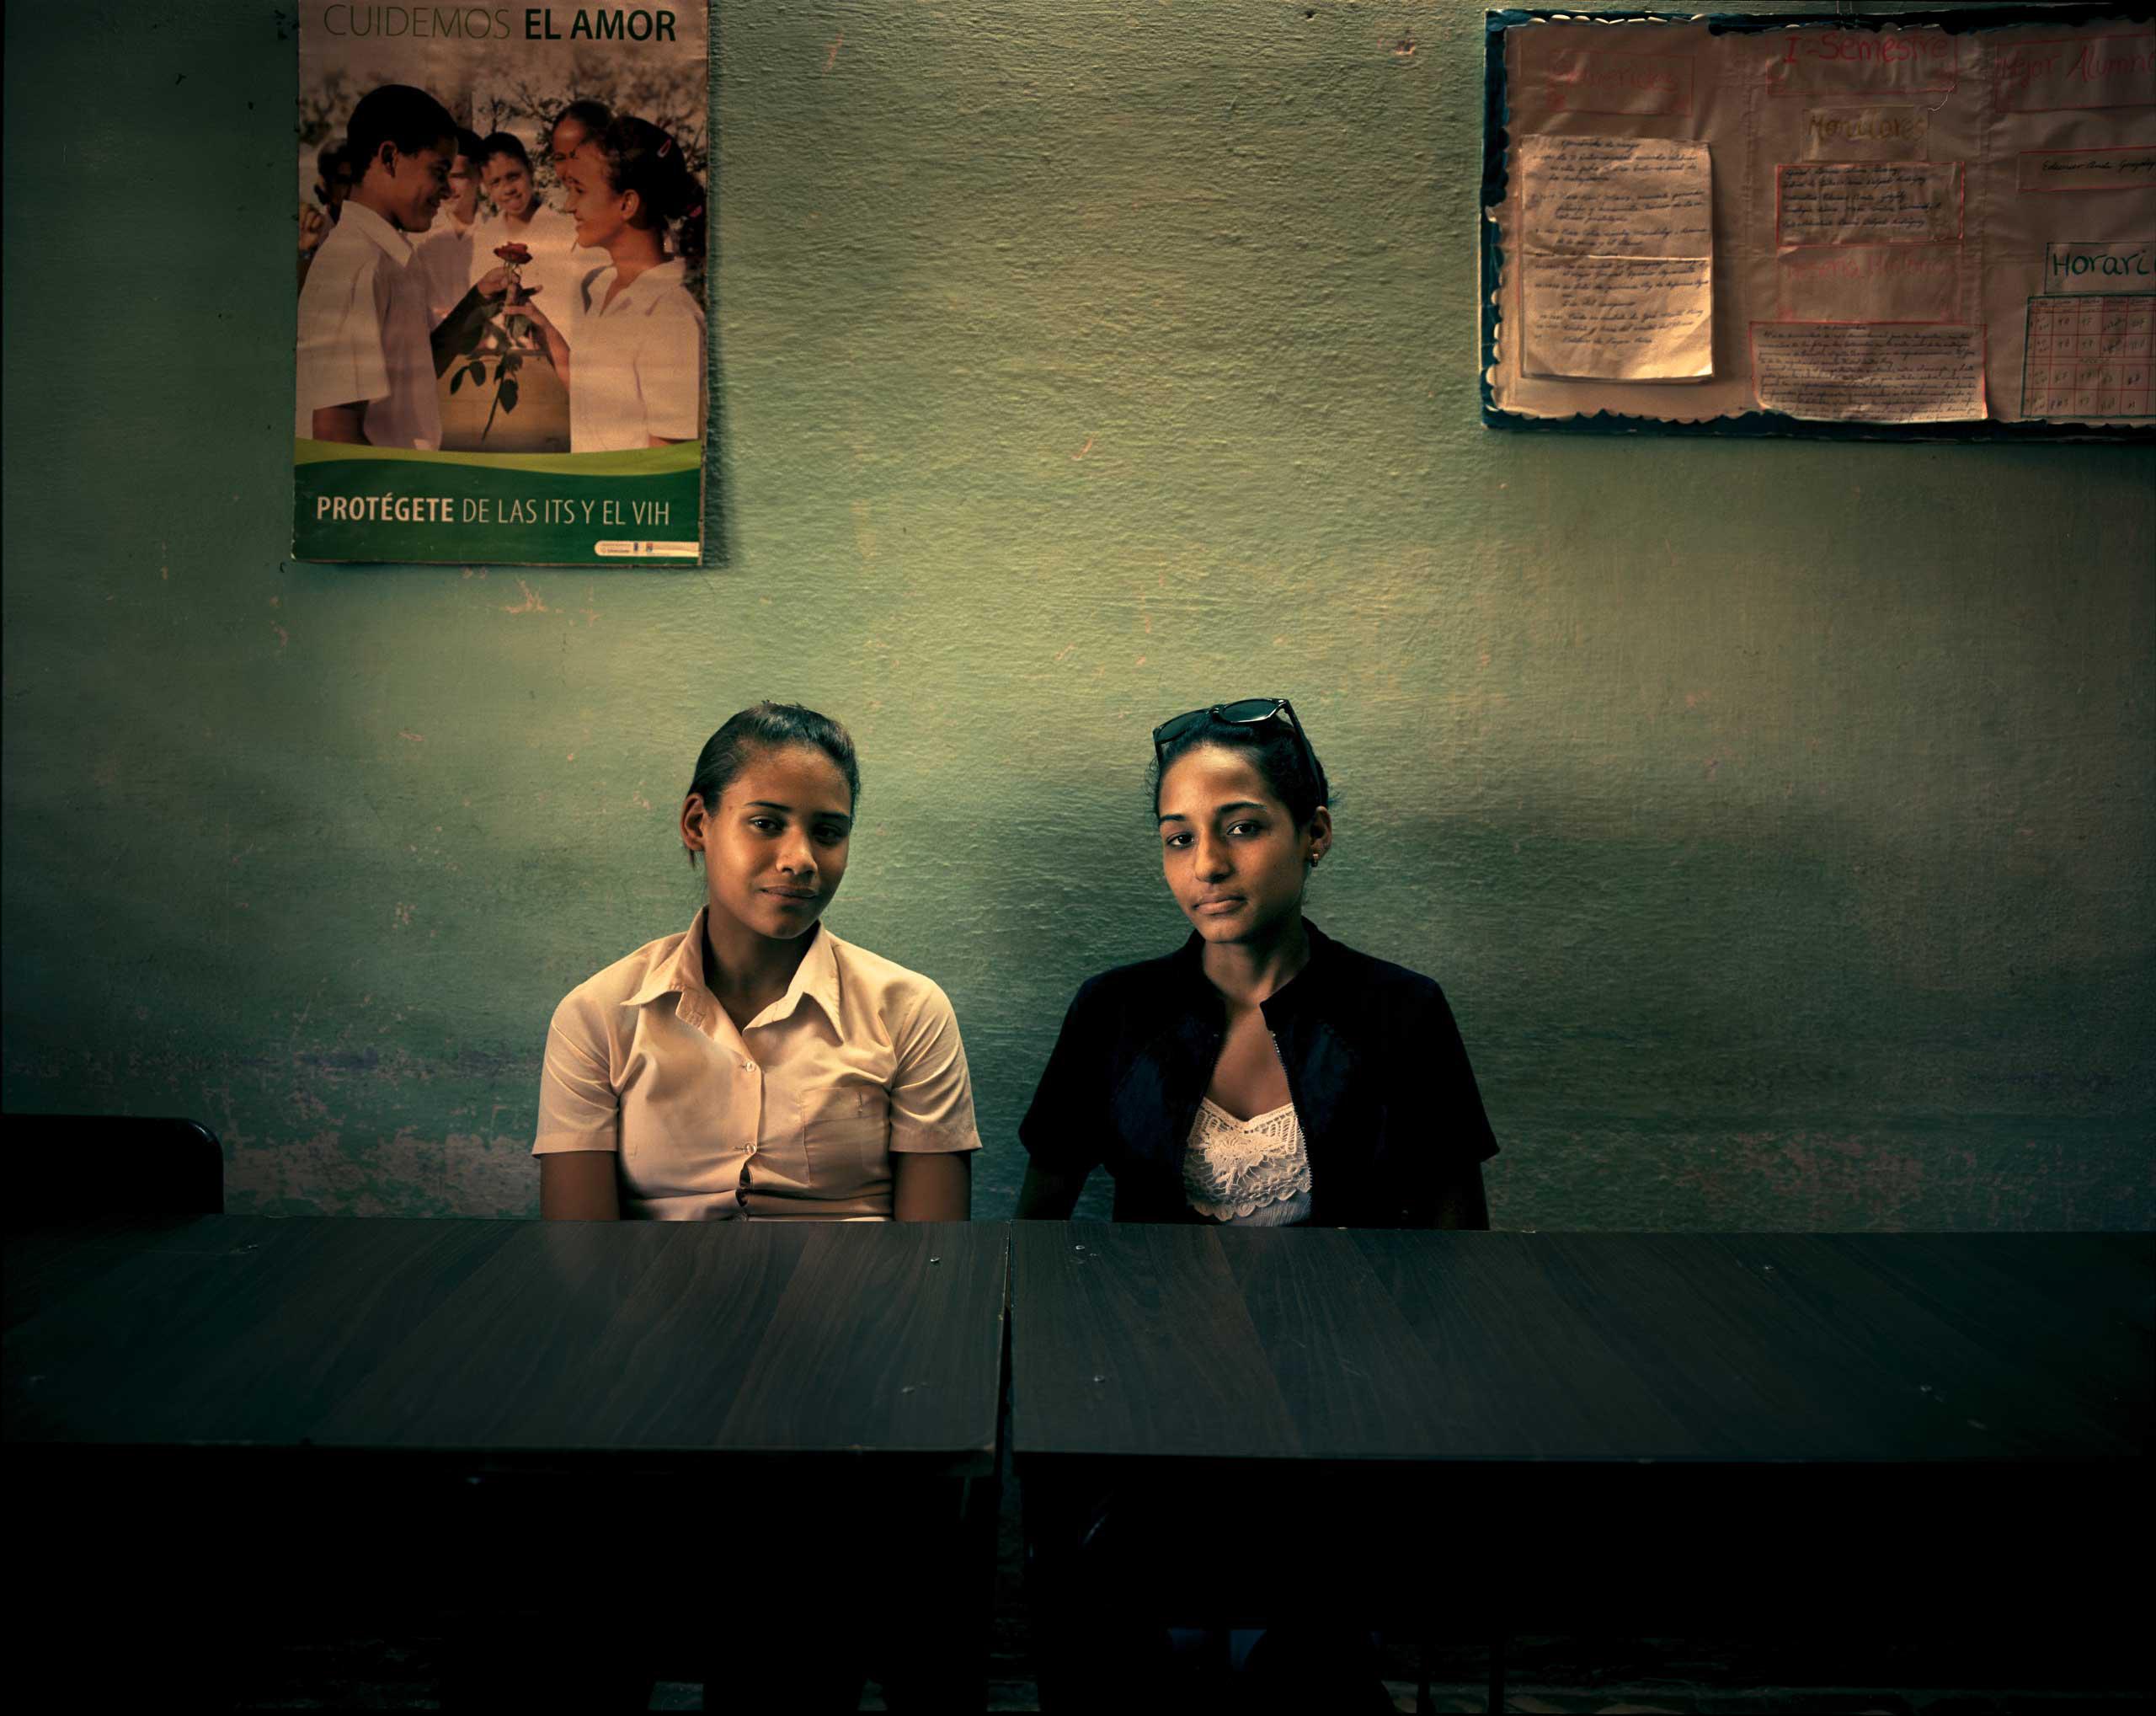 School girls in a classroom in Niquero, a town 750 kilometers east of Havana.